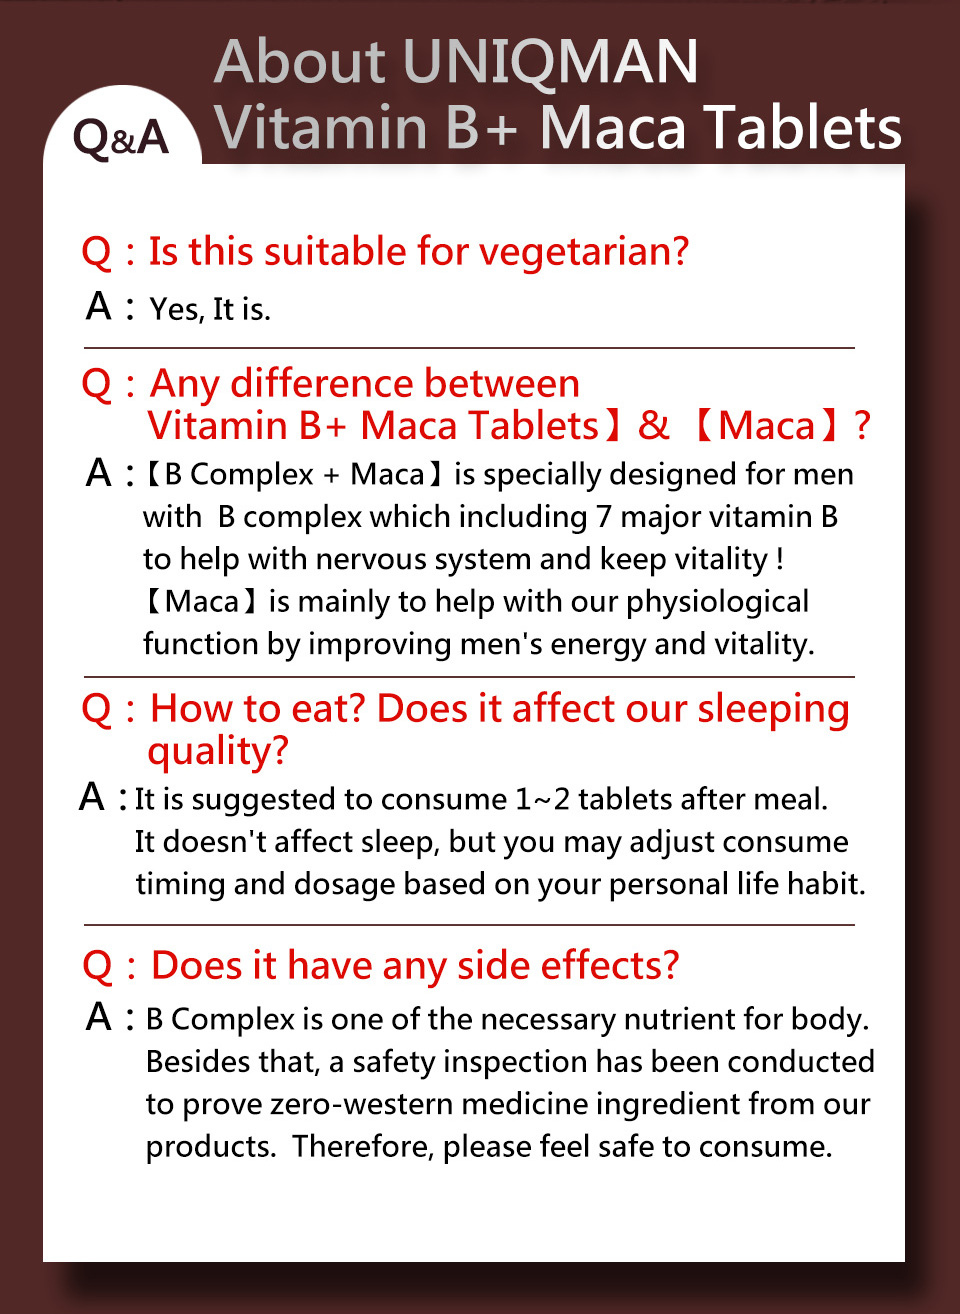 UNIQMAN Vitamin B contains more than 95% of black Maca